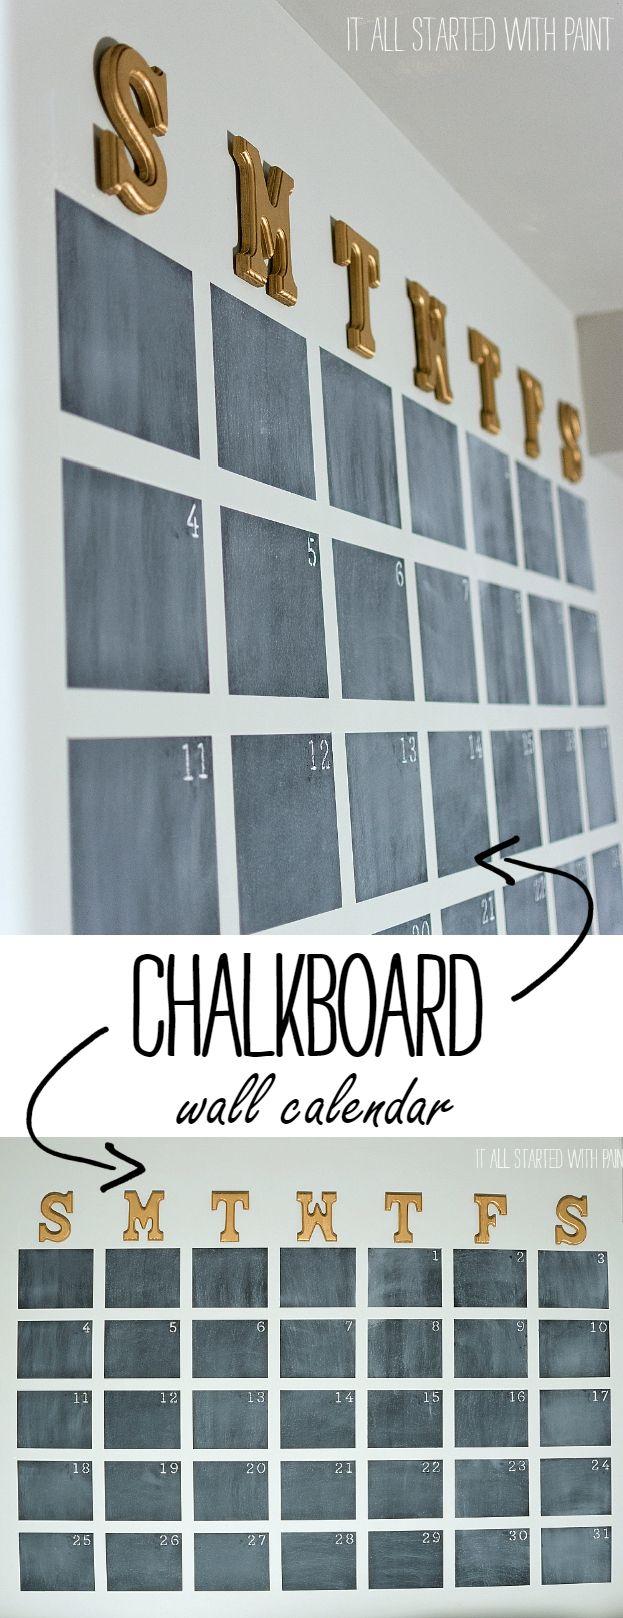 Chalkboard Wall Calendar DIY | Pinterest | Chalkboard wall calendars ...